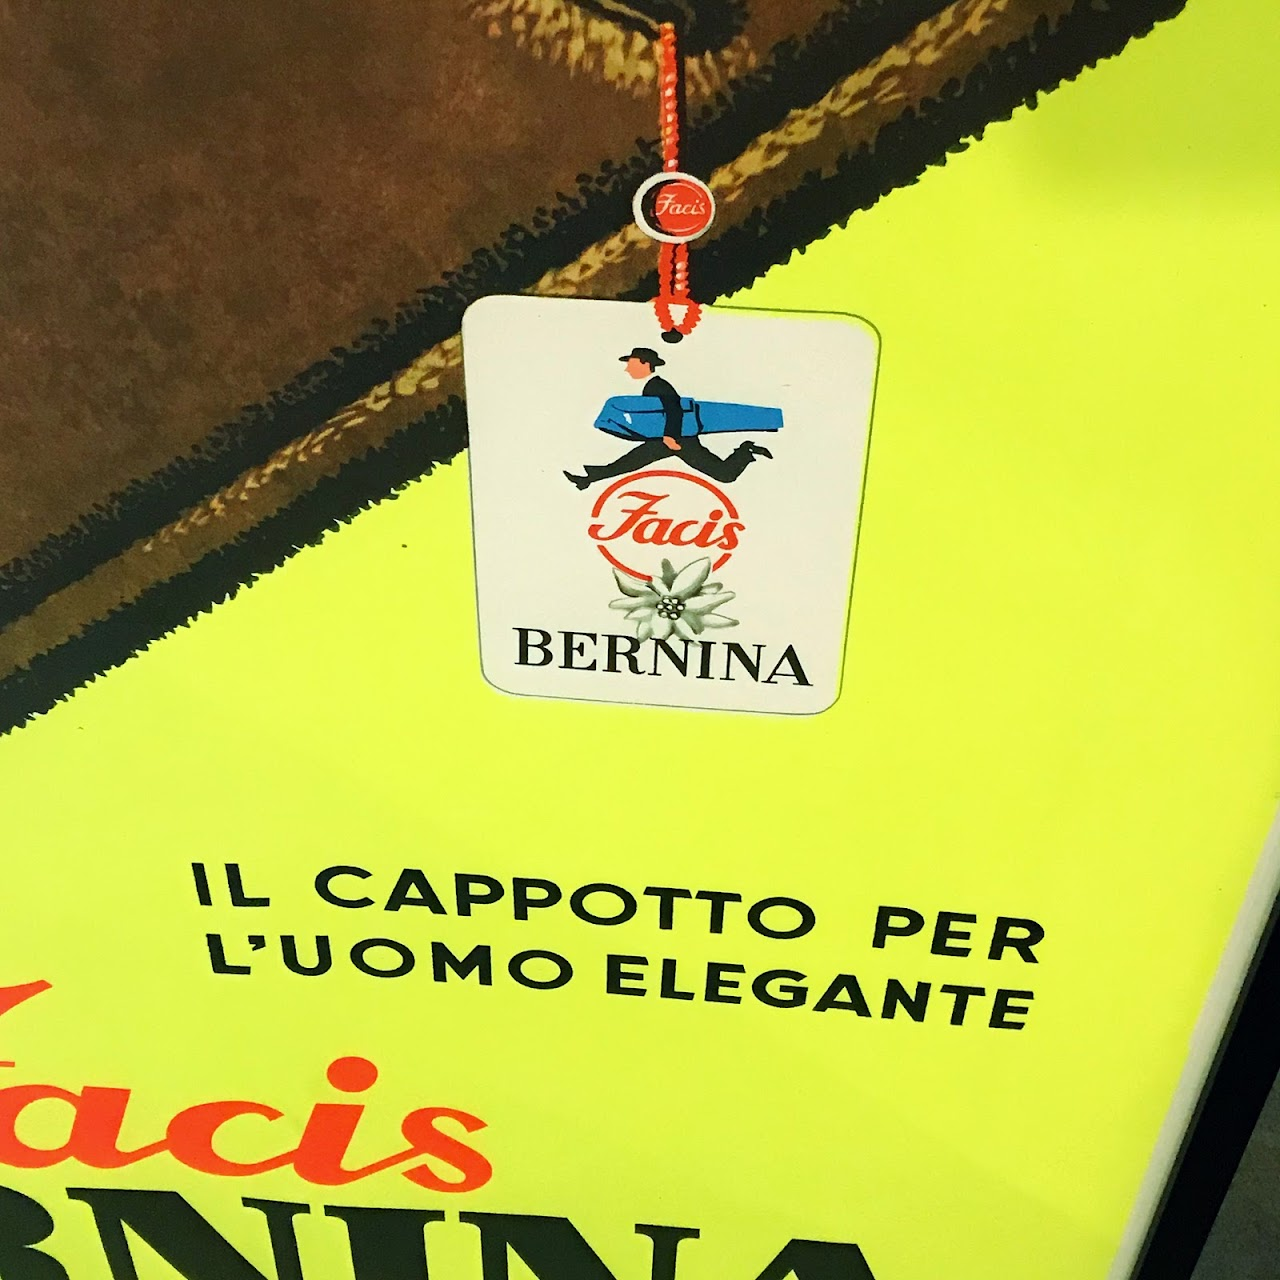 Armando Testi Large Facis Bernina Framed Poster